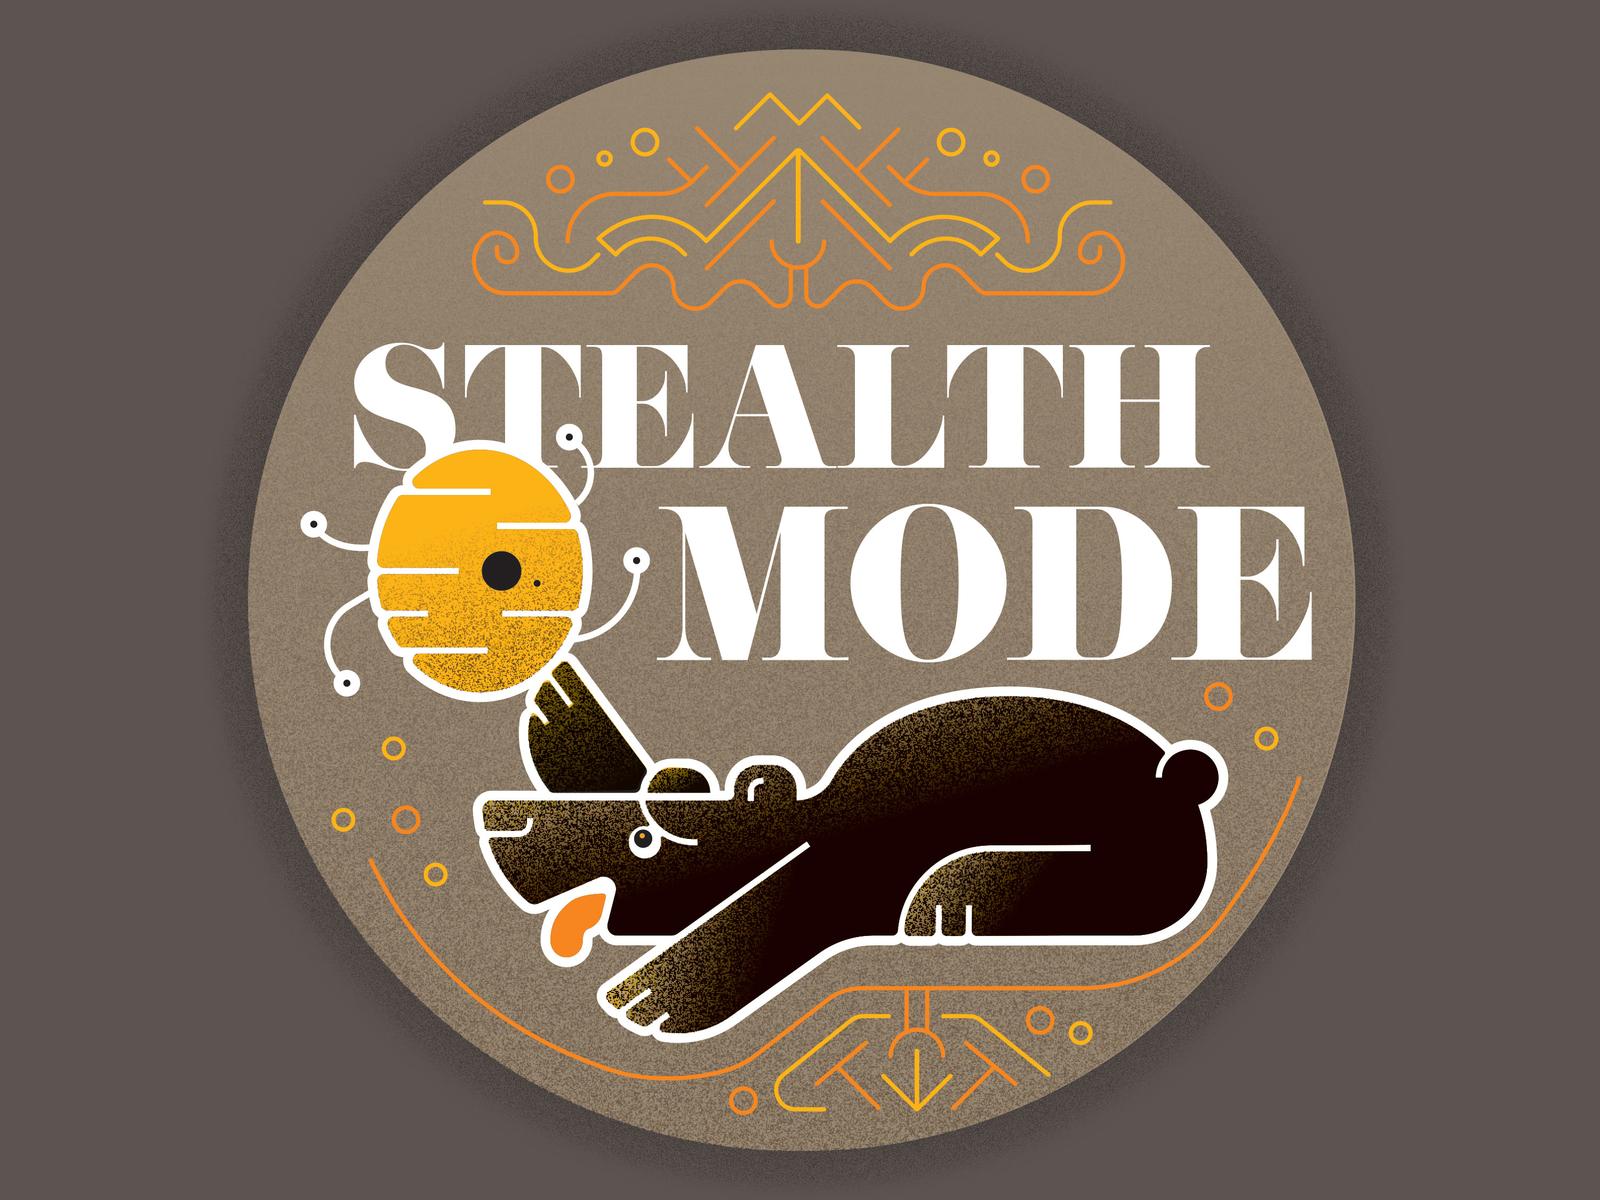 Stealthmode 4x